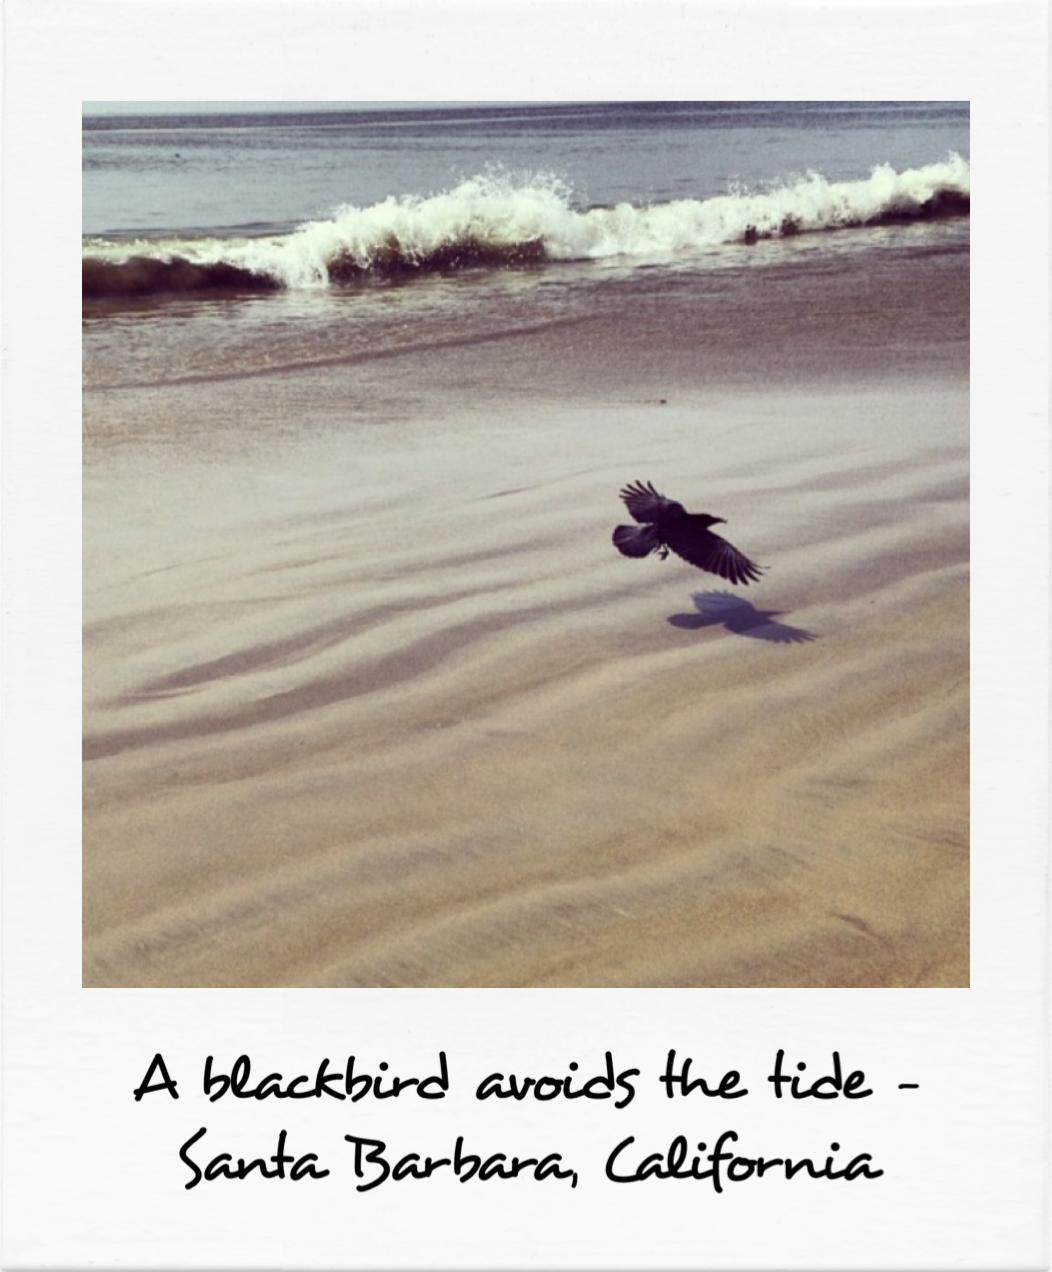 A blackbird avoids the tide - Santa Barbara, California